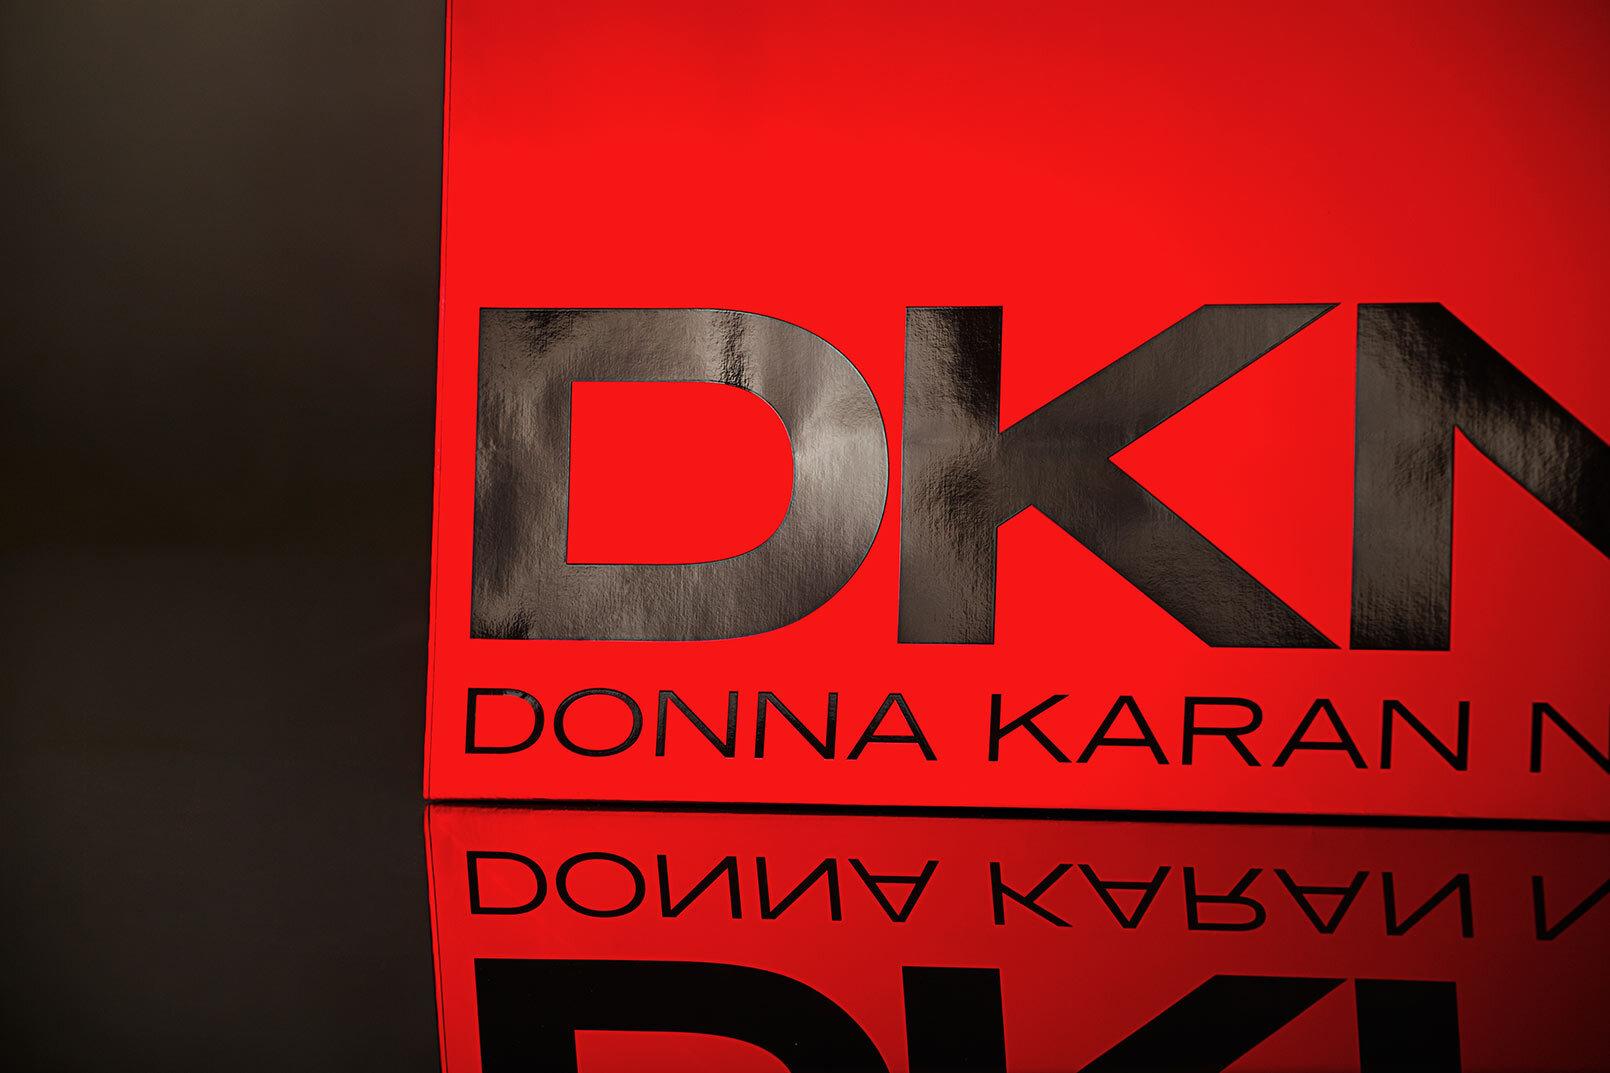 Dkny-Shopping-Bag-Holiday-Design-Packaging-Company.jpg